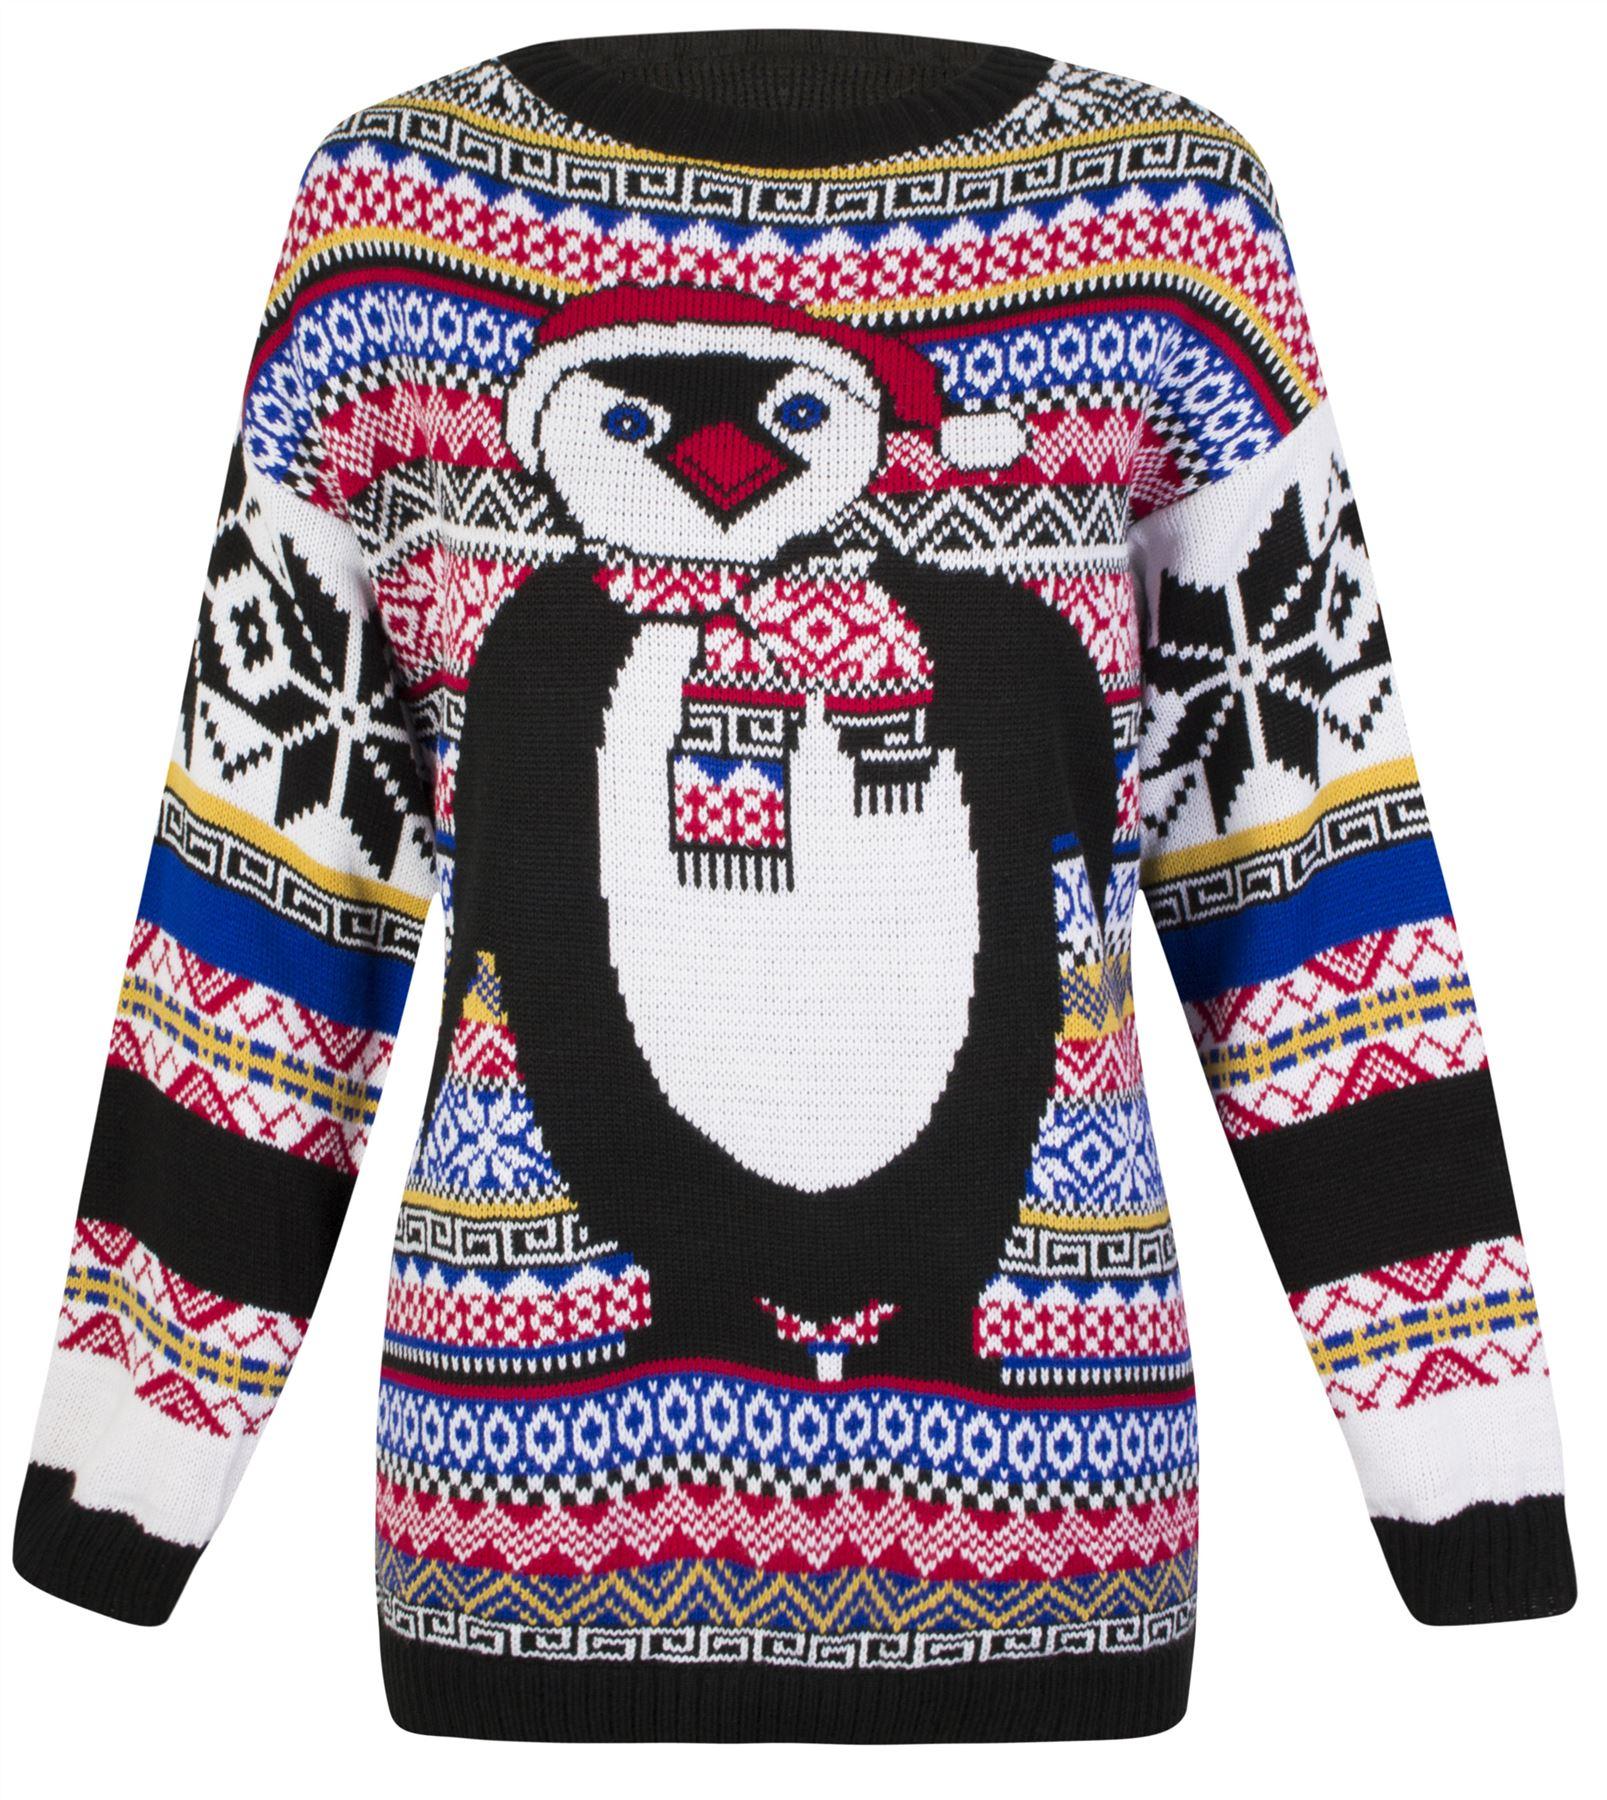 Knitting Lady Penguins : Womens knitted fairisle penguin christmas novelty sweater